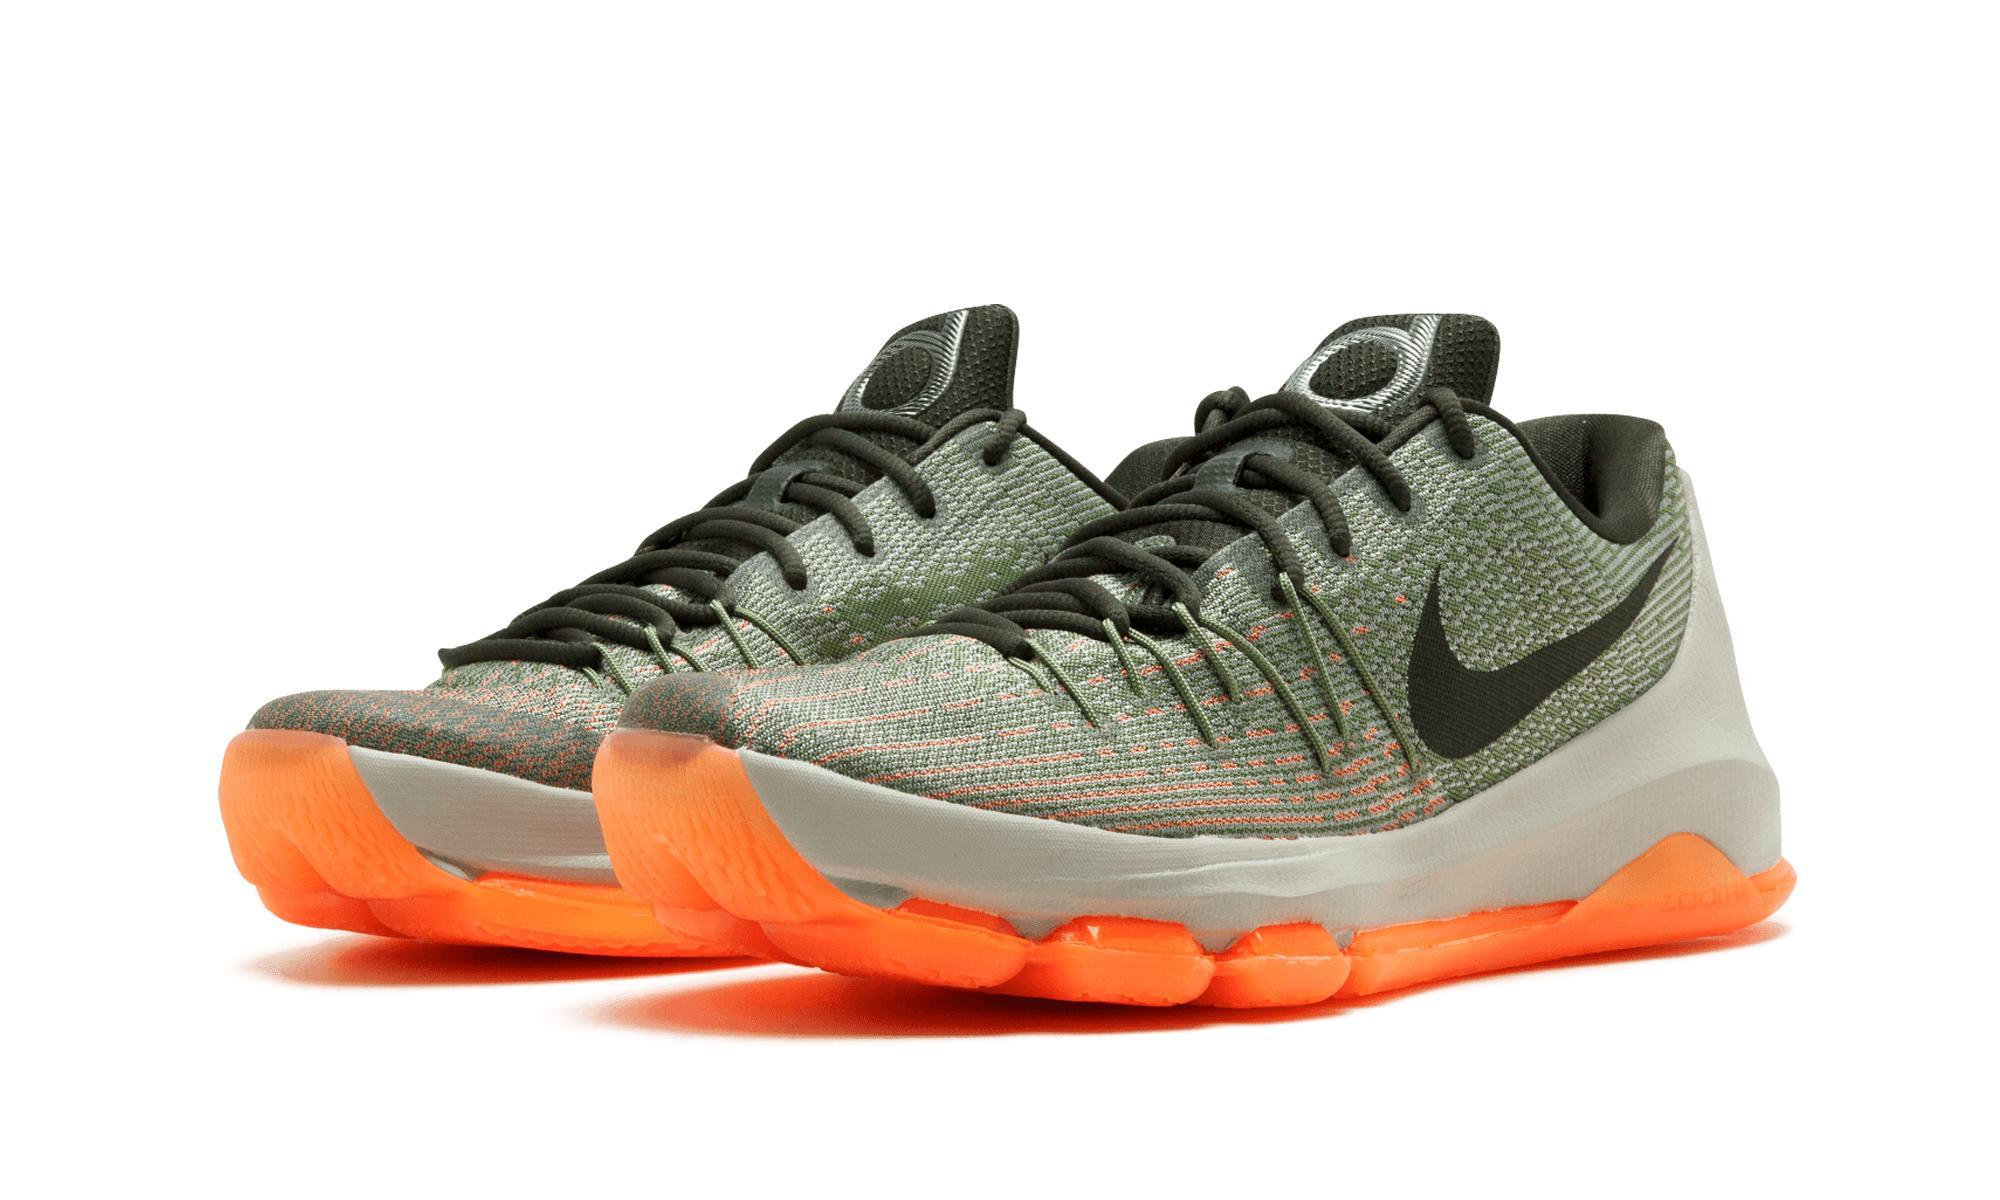 91513ca38454 Nike - Multicolor Kd 8 for Men - Lyst. View fullscreen